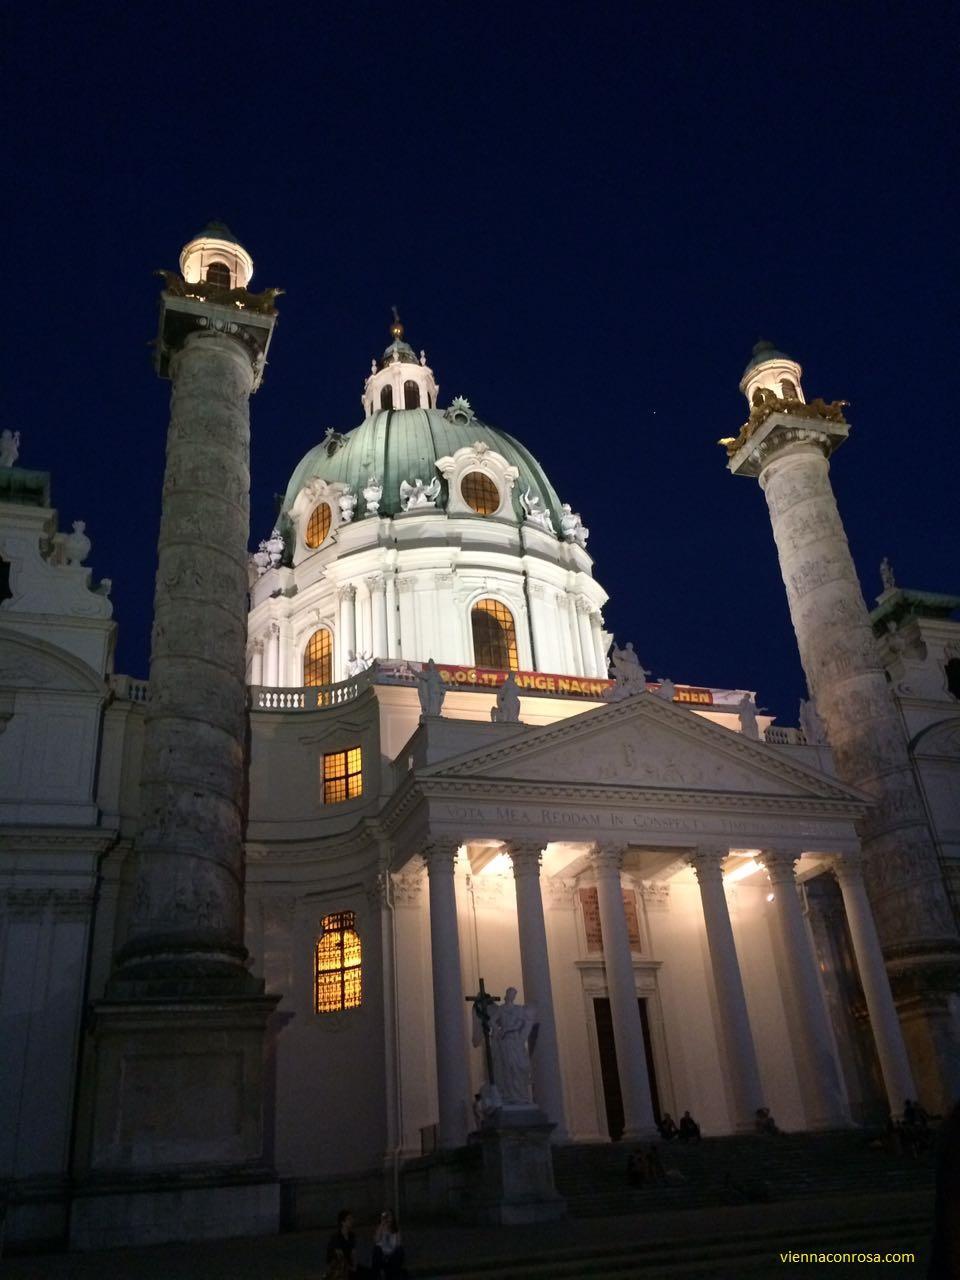 s.carlo-chiesa-vienna-visite-guidate-antonio-rosa